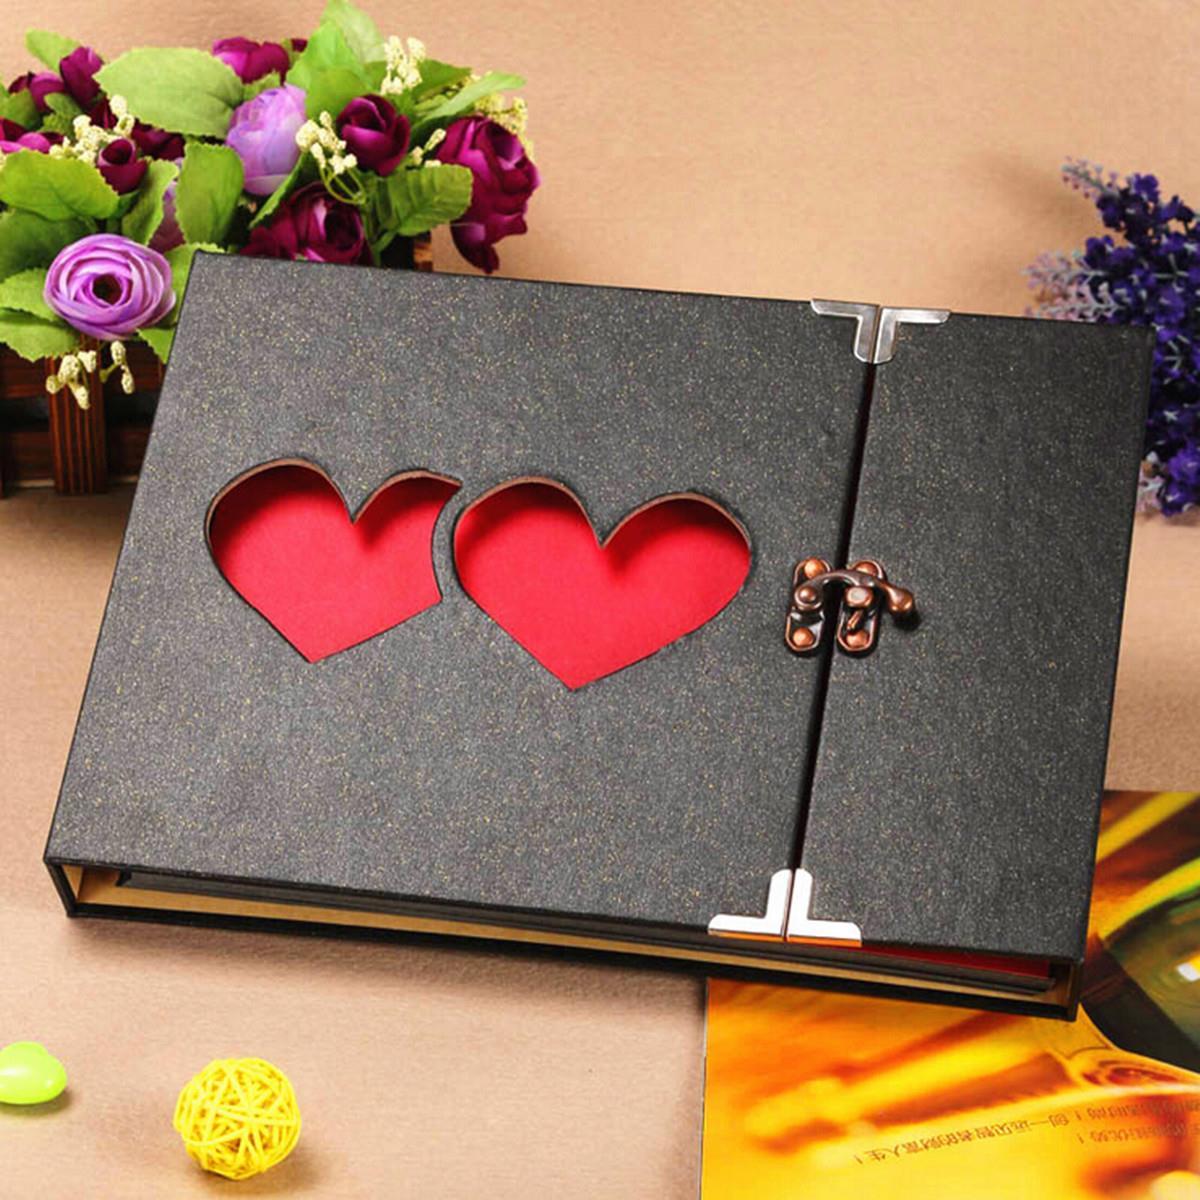 How to scrapbook a photo album - Hot Retro Wedding Paper Metal Gallery Diy Photo Album In Home Decoration 27x19x3 5cm